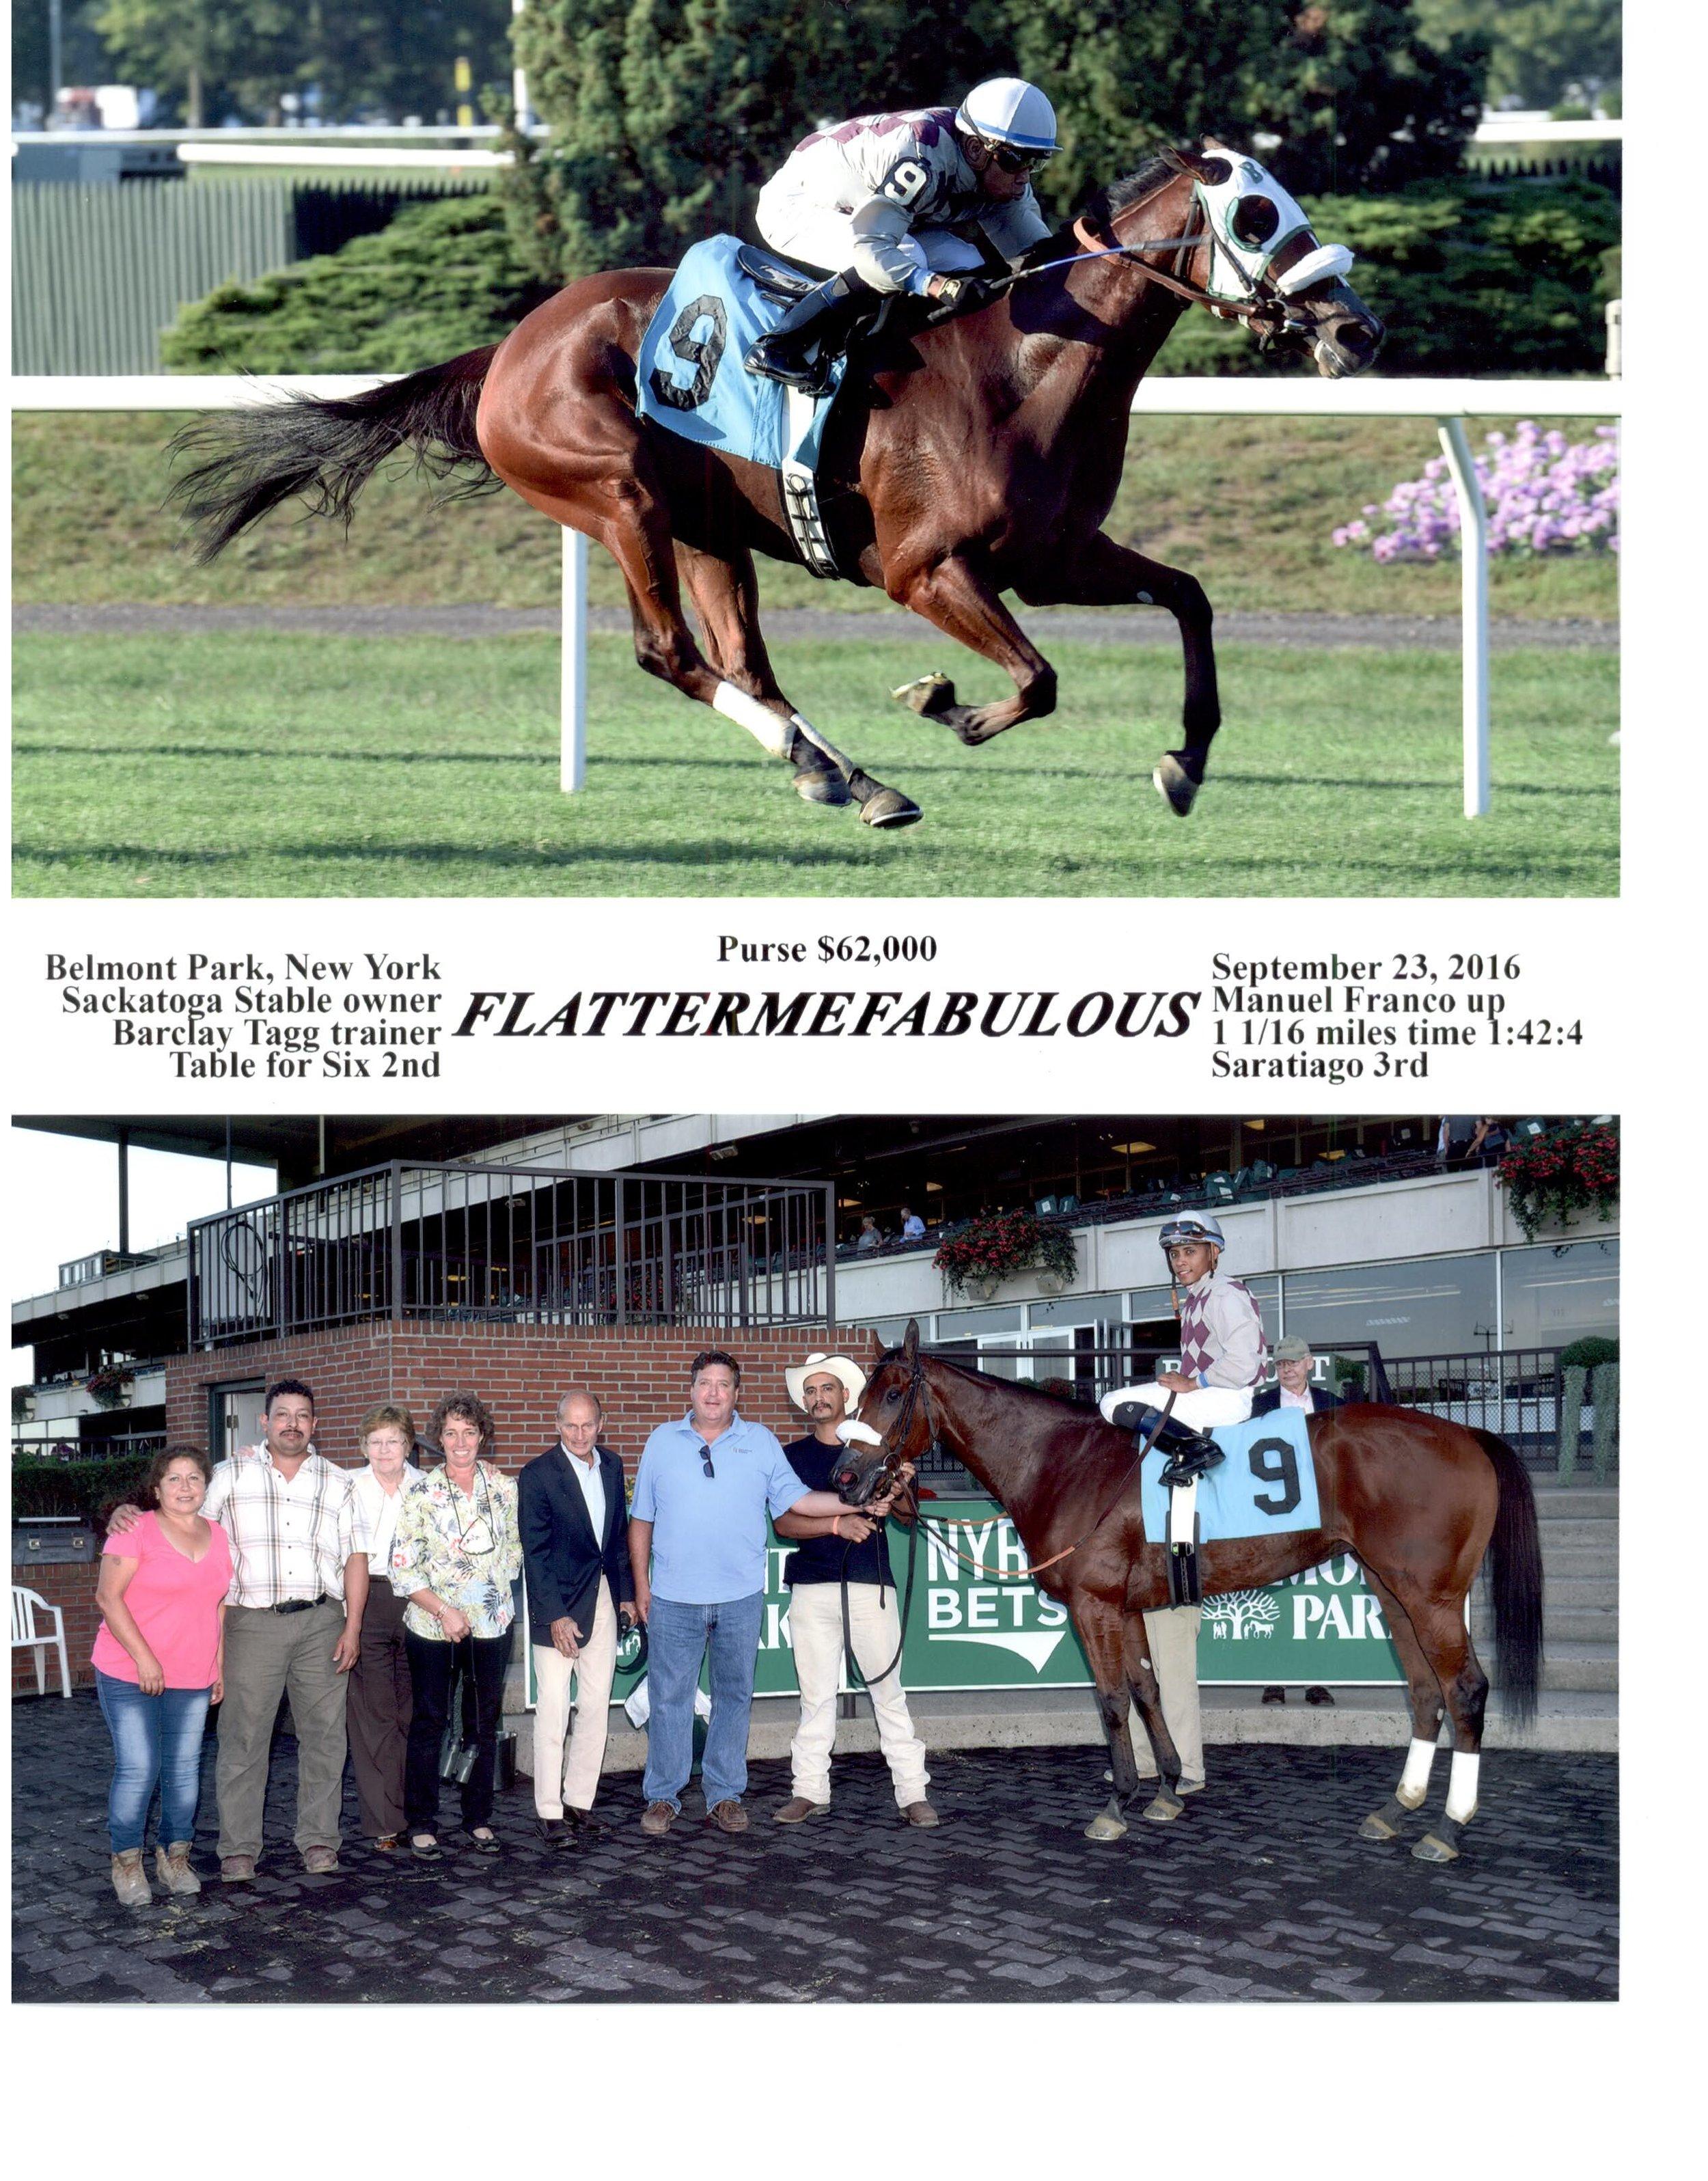 9-23-2016 - Flattermefabulous Winning Photo - Belmont Park.jpg